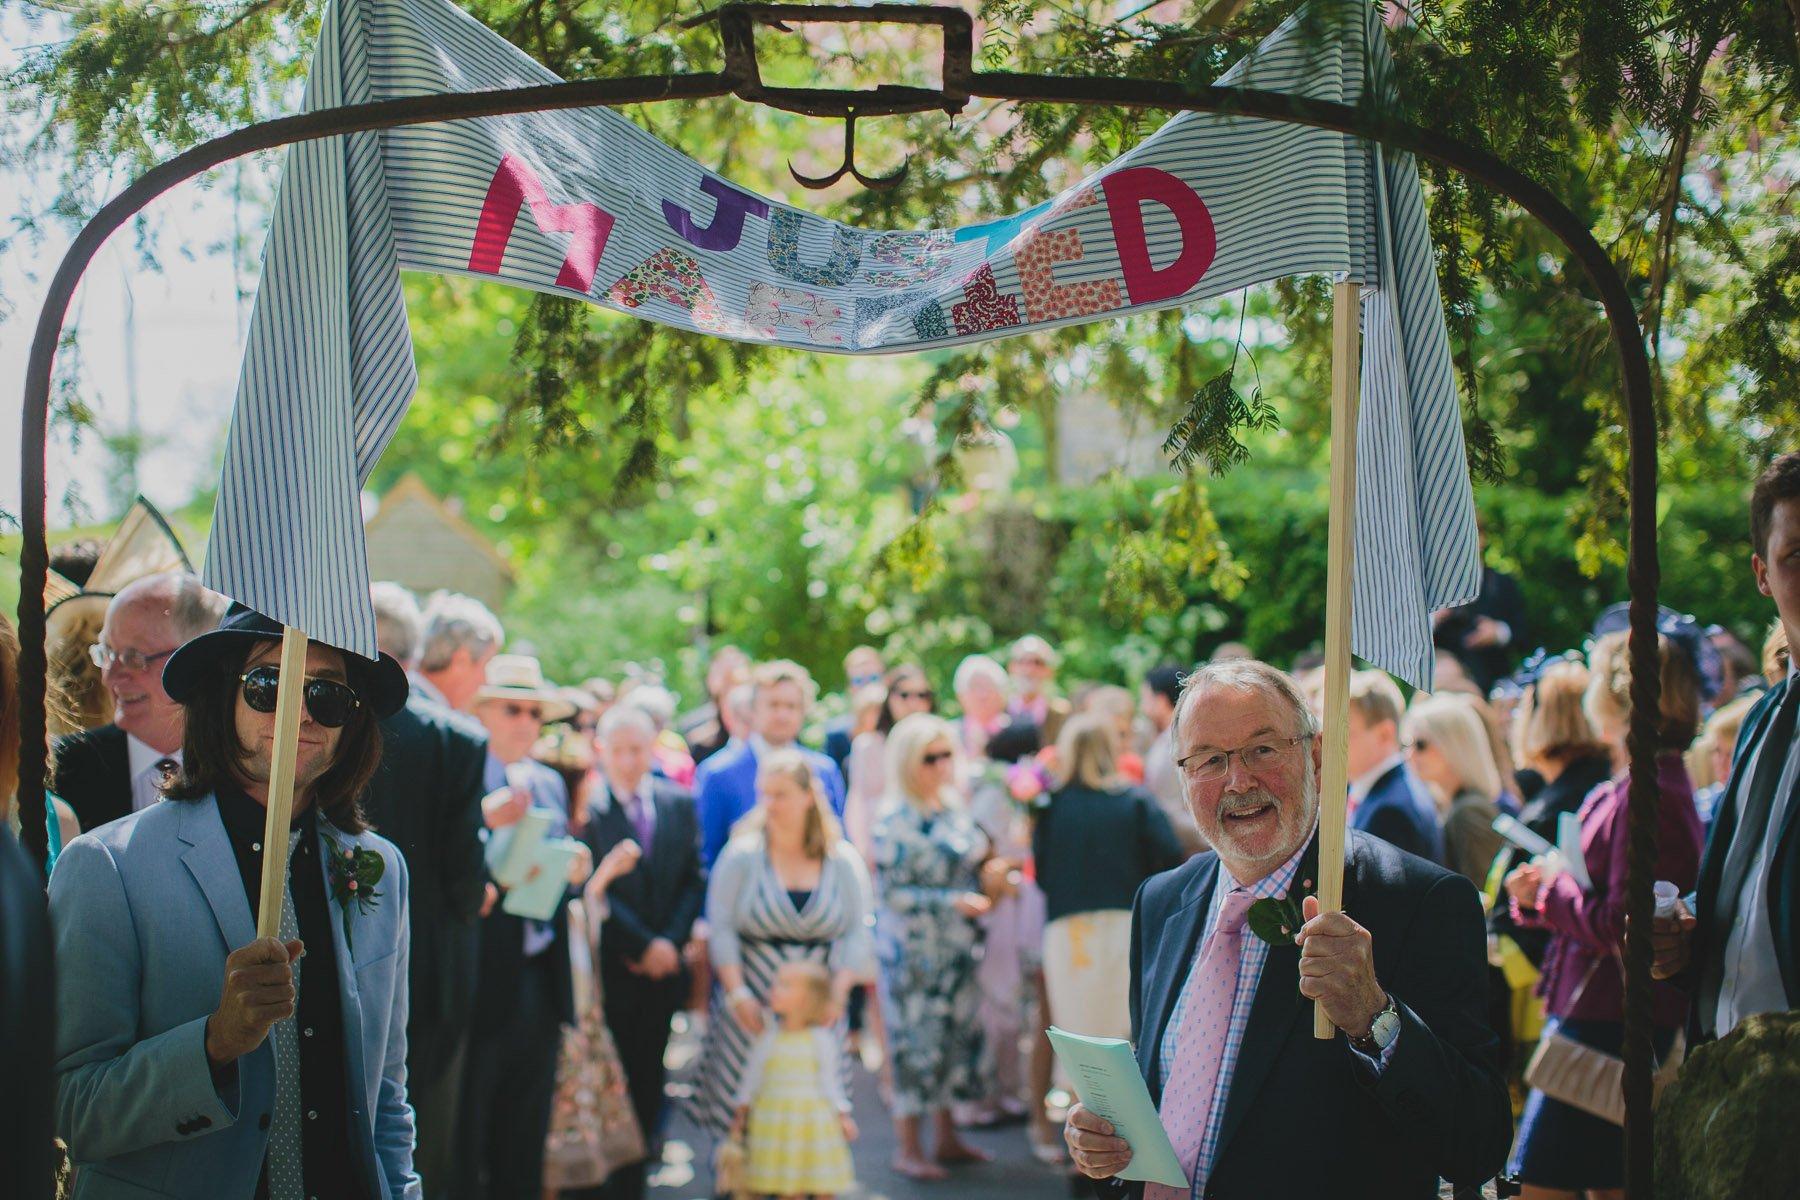 Buckinghamshire-Wedding-Lizzie-Duncan-079